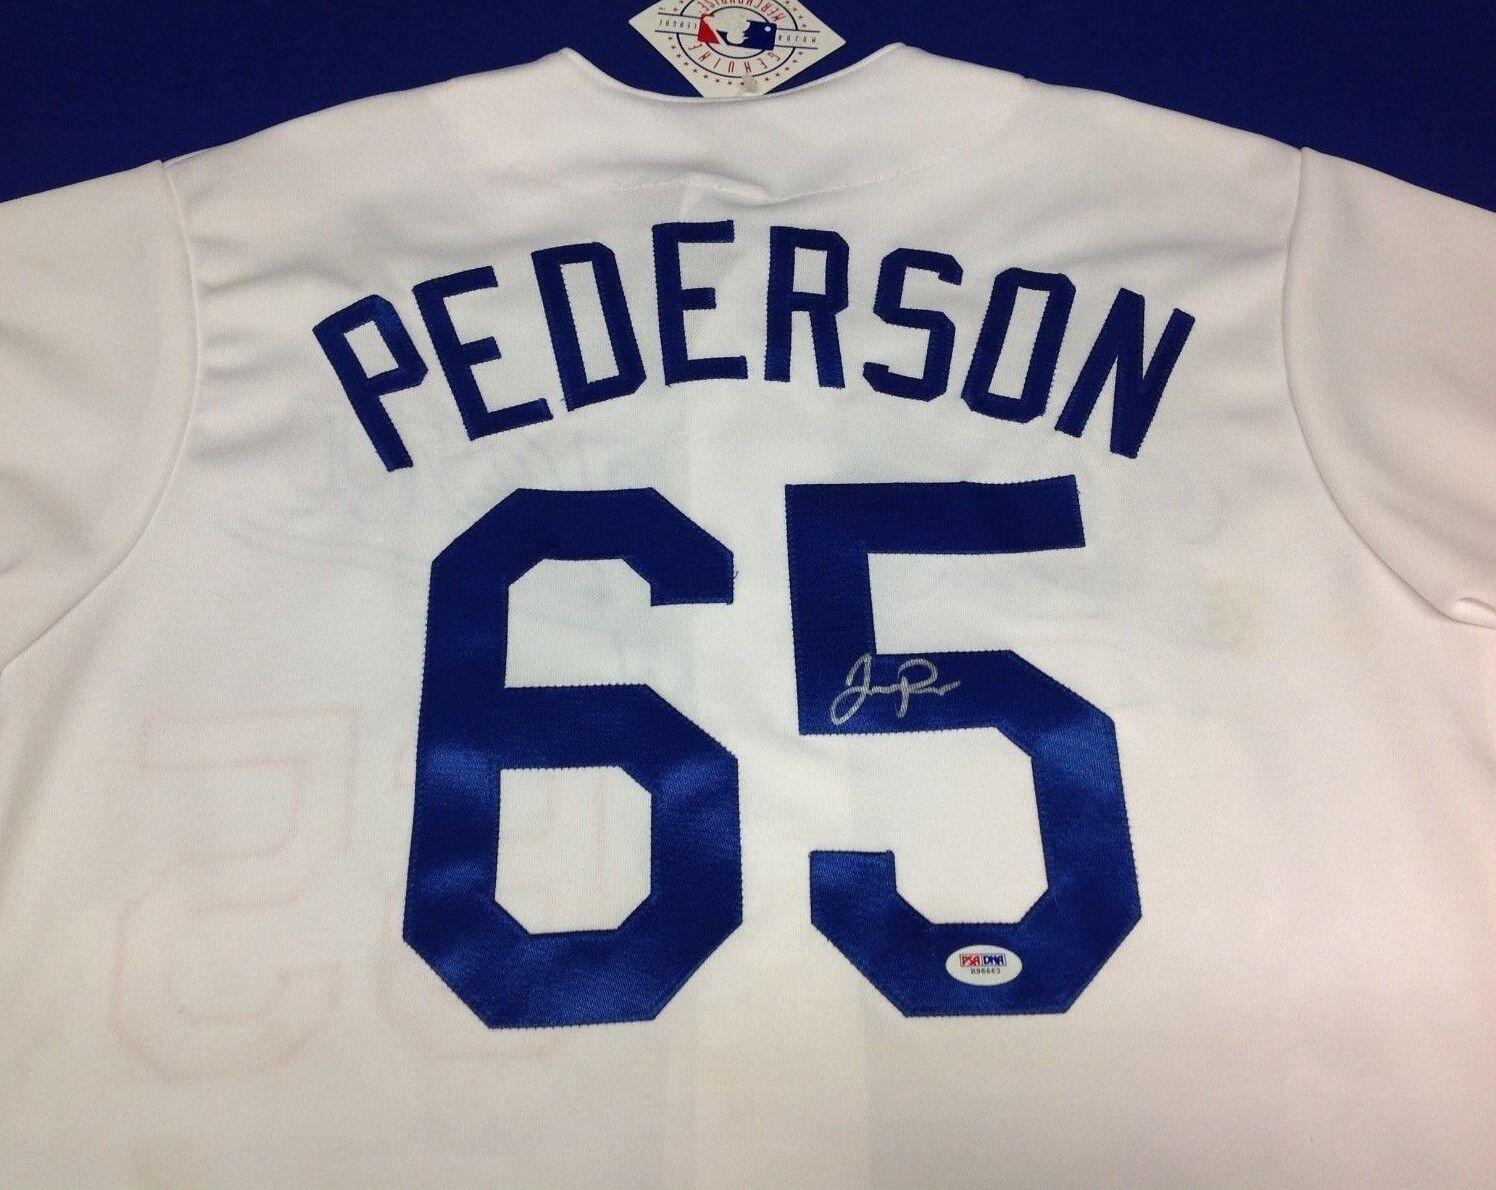 Joc Pederson Signed Los Angeles Dodgers Majestic Jersey - PSA/DNA # R96663